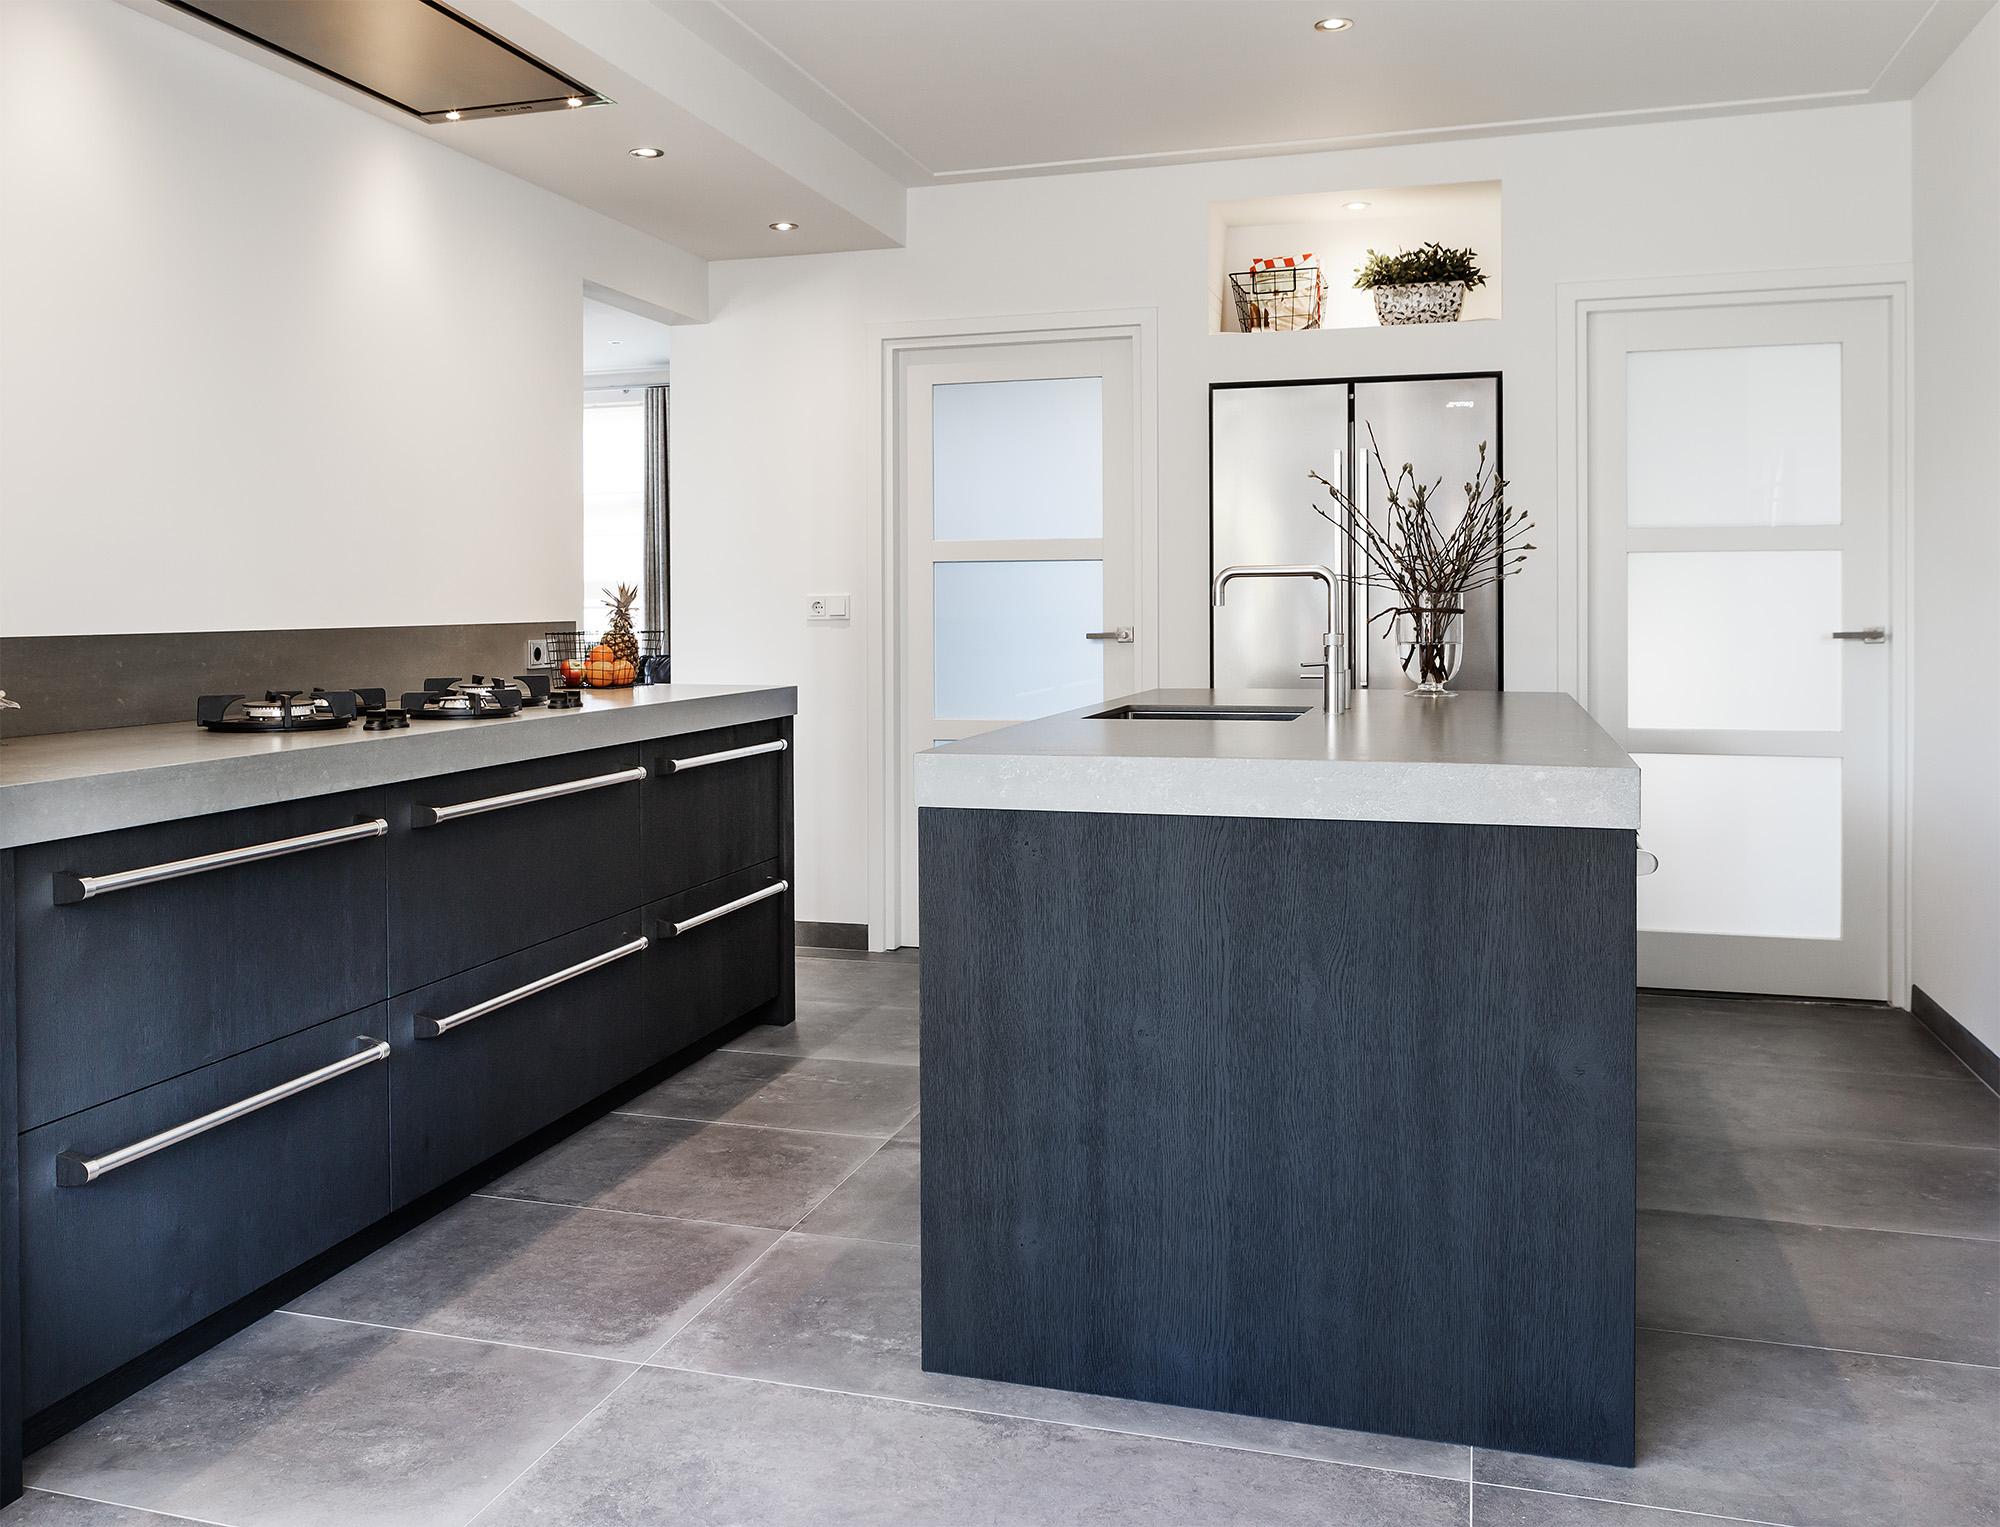 Wit Stoere Keuken : Stoere keuken met betonlook blad u royaal maatwerk keukens